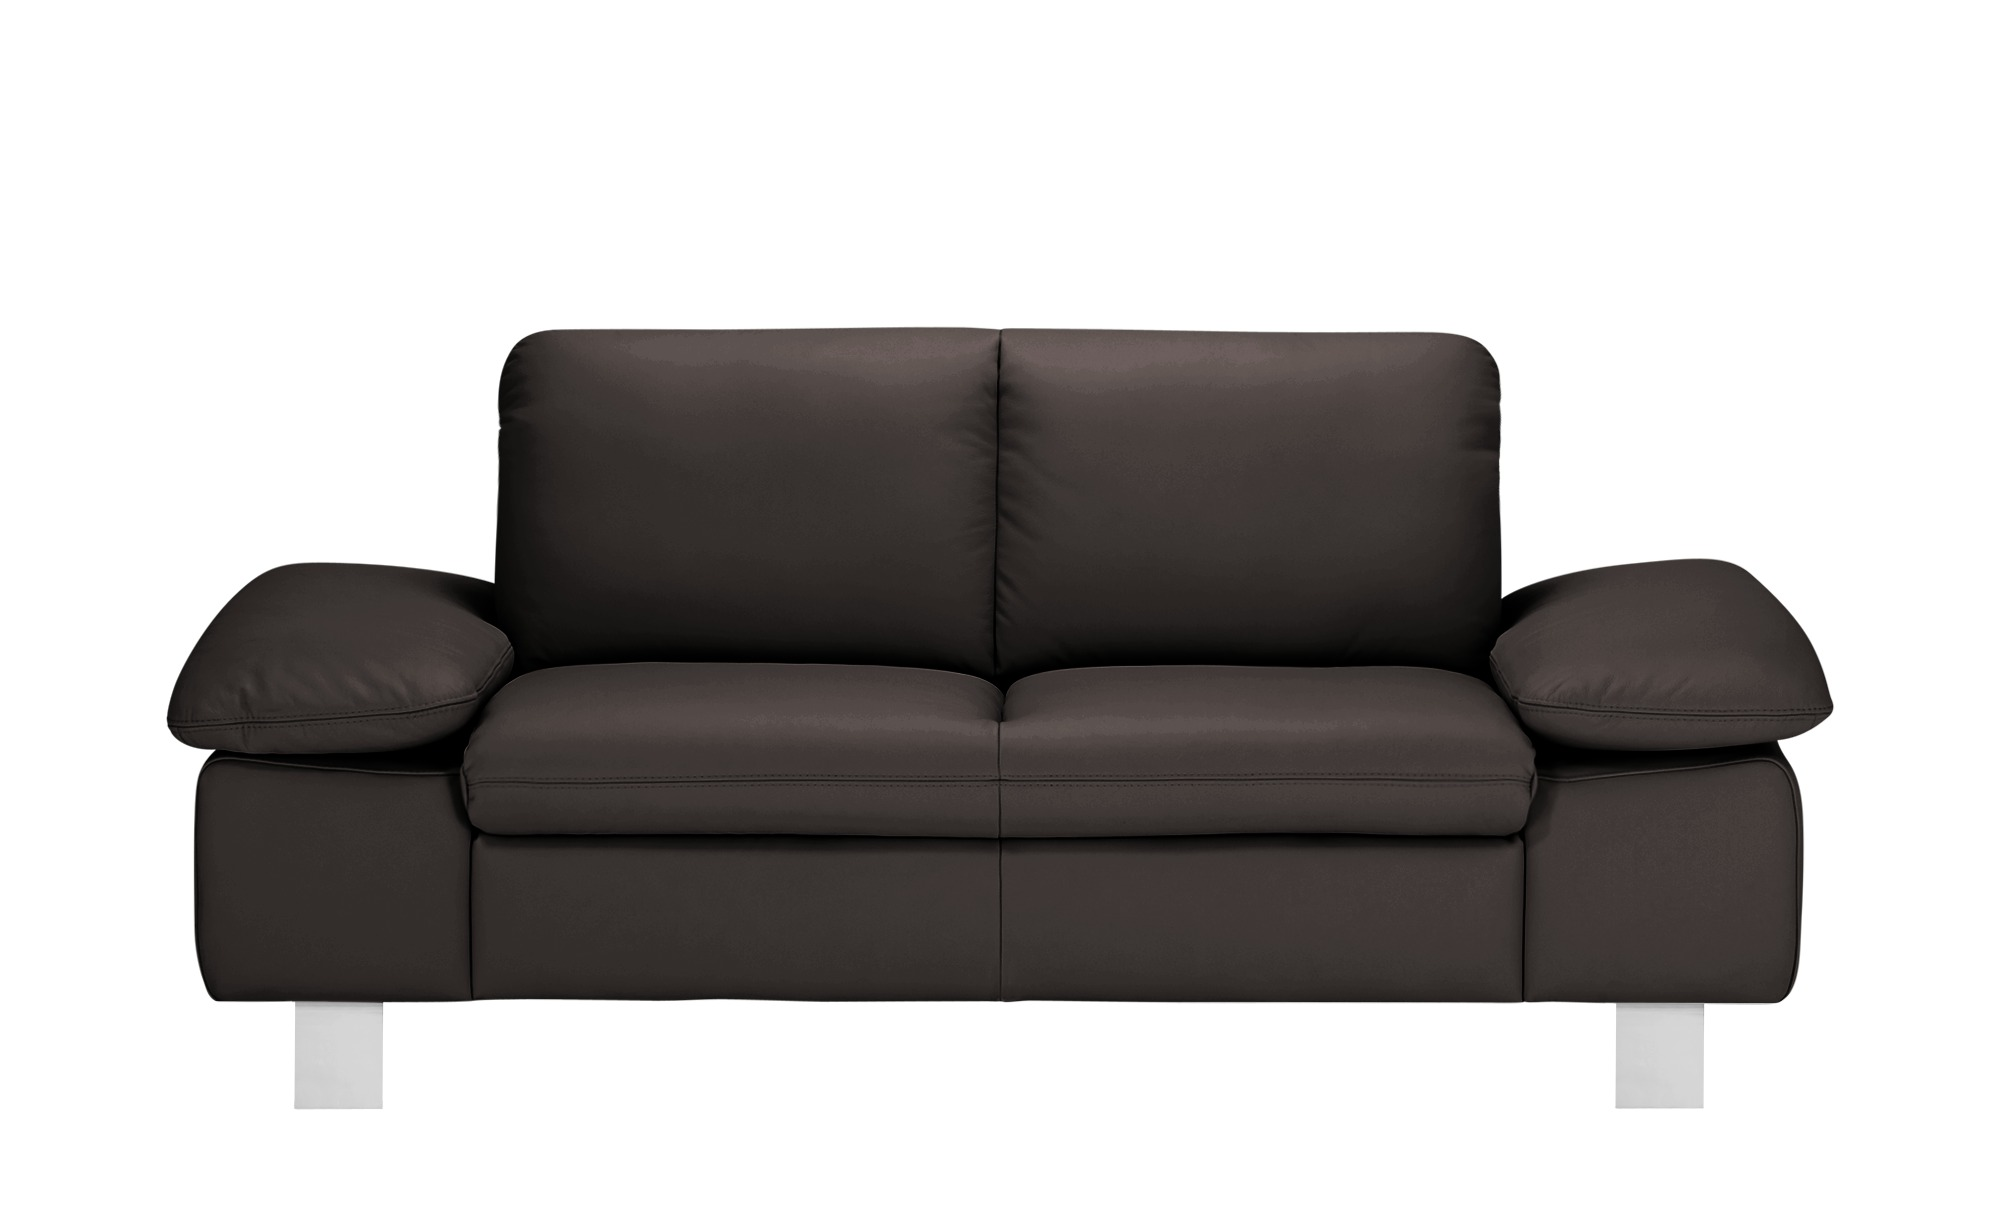 smart Sofa  Finola ¦ braun ¦ Maße (cm): B: 181 H: 83 T: 94 Polstermöbel > Sofas > 2-Sitzer - Höffner